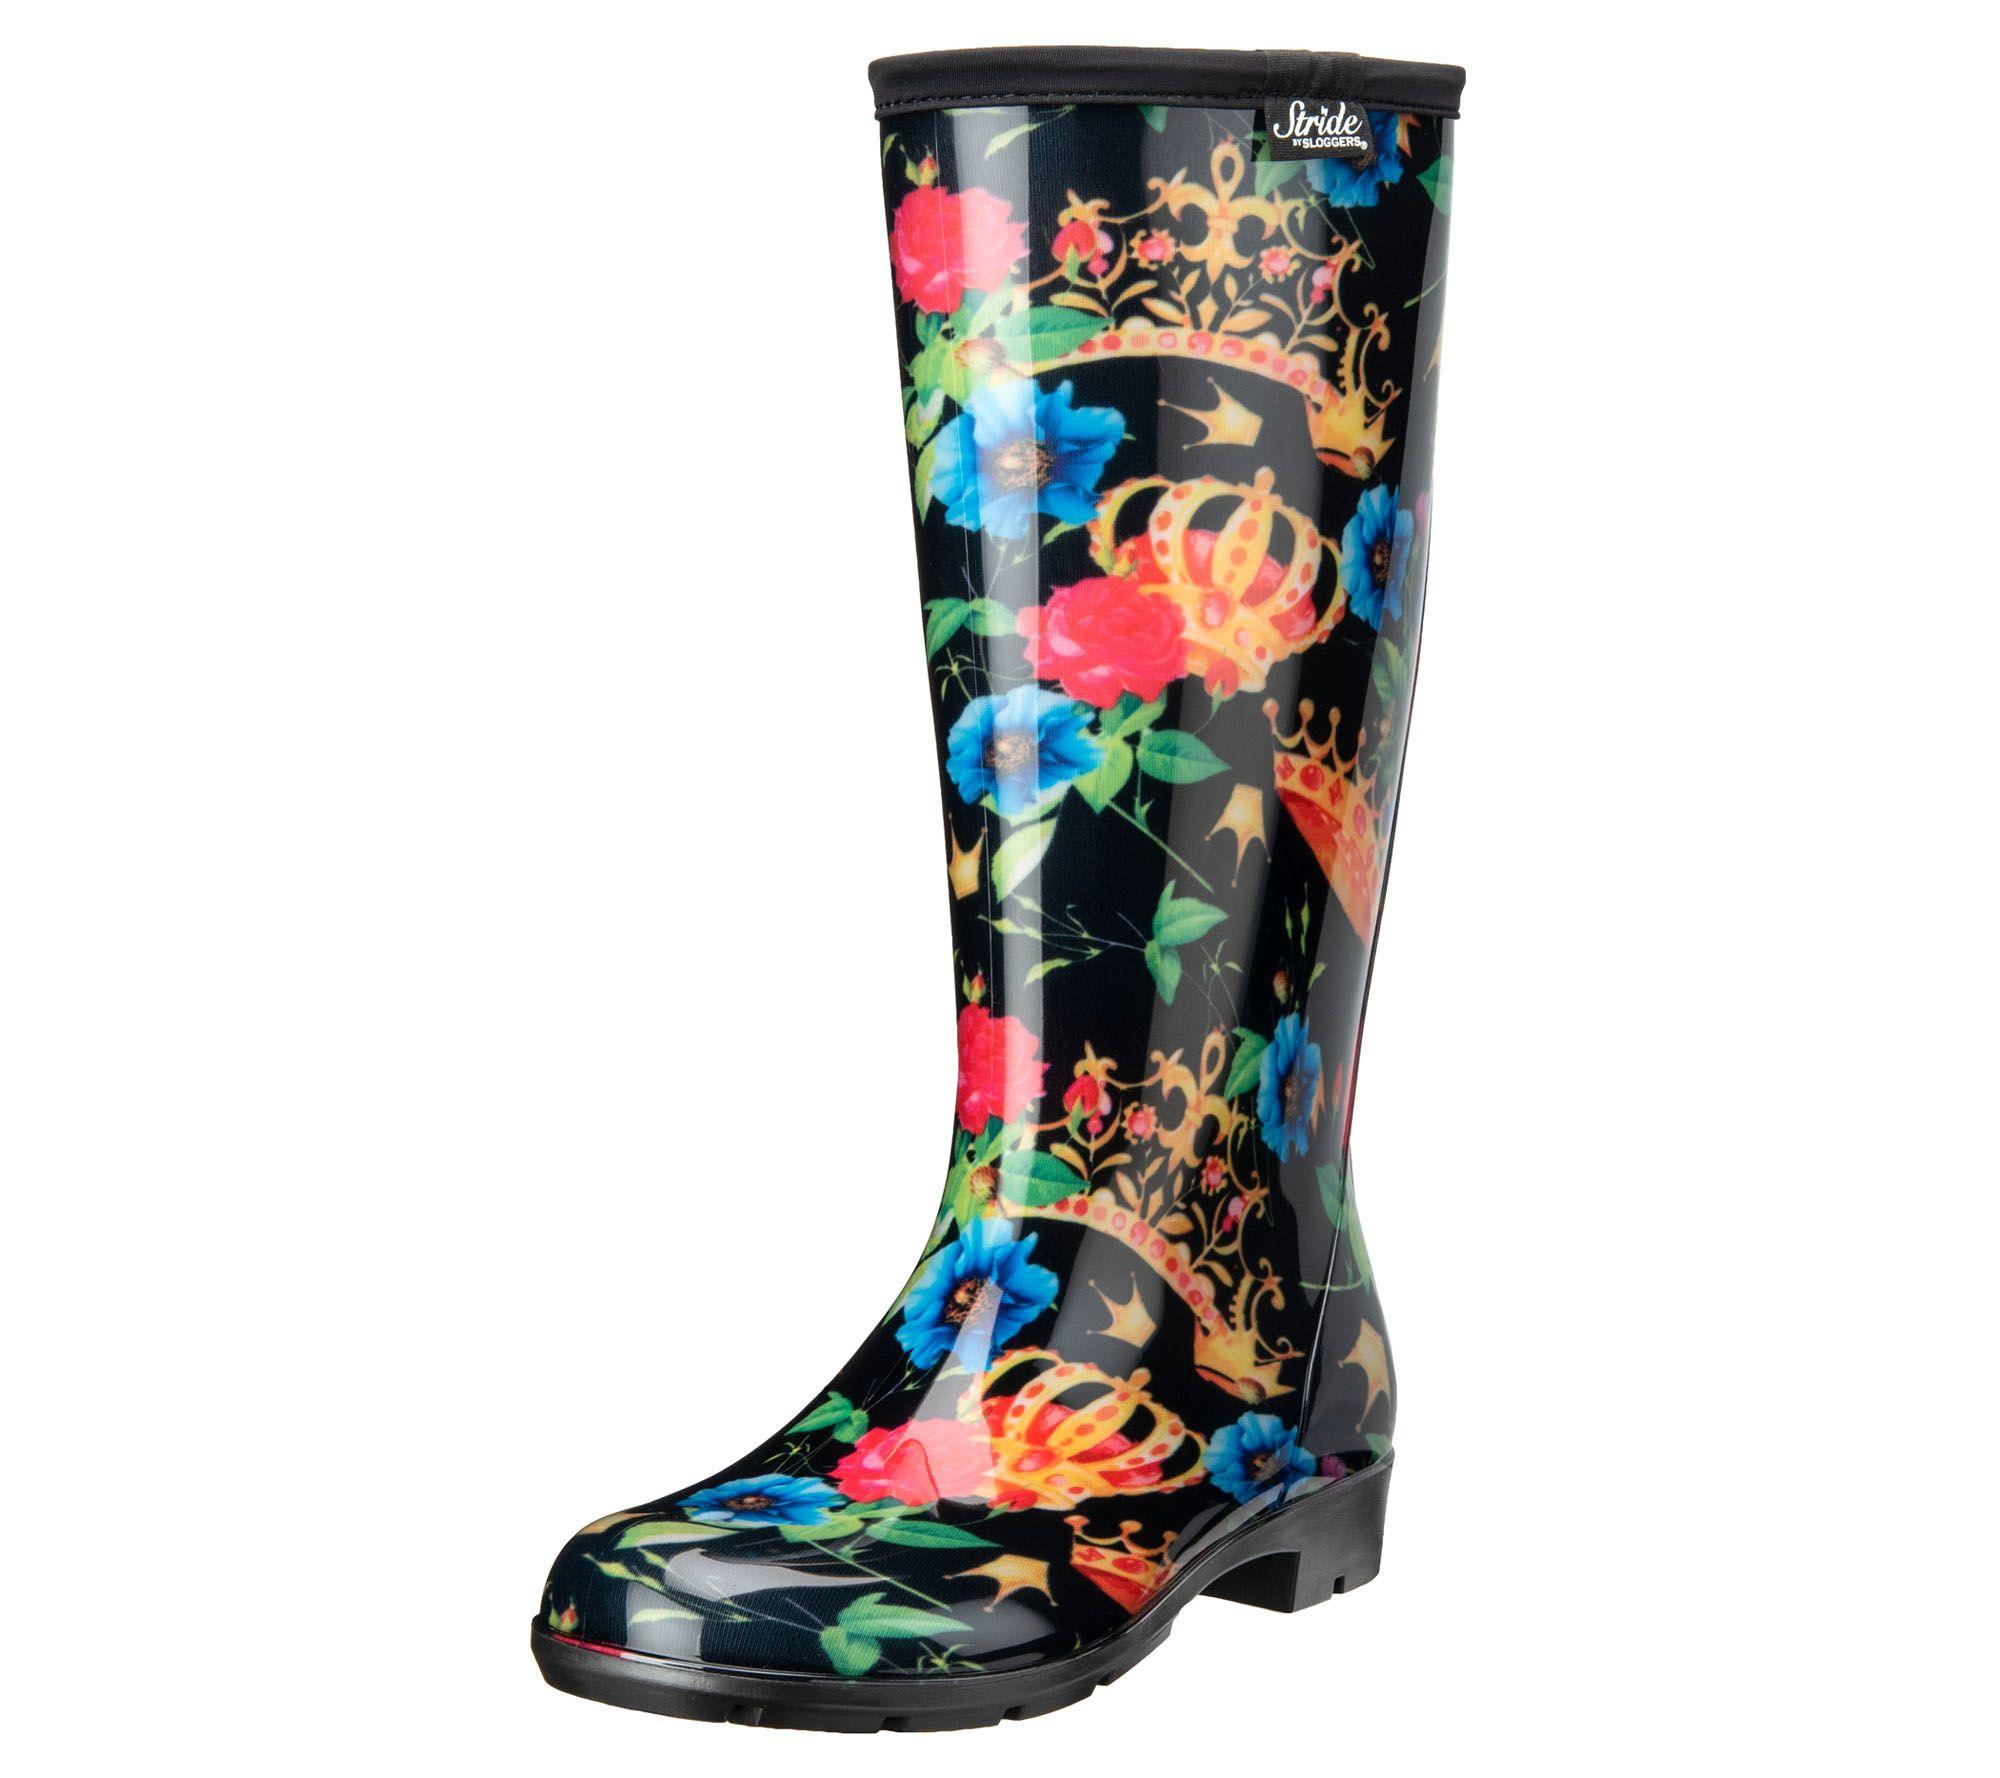 5218fa12080 Stride by Sloggers Waterproof Tall Fashion Rainboots - Page 1 — QVC.com